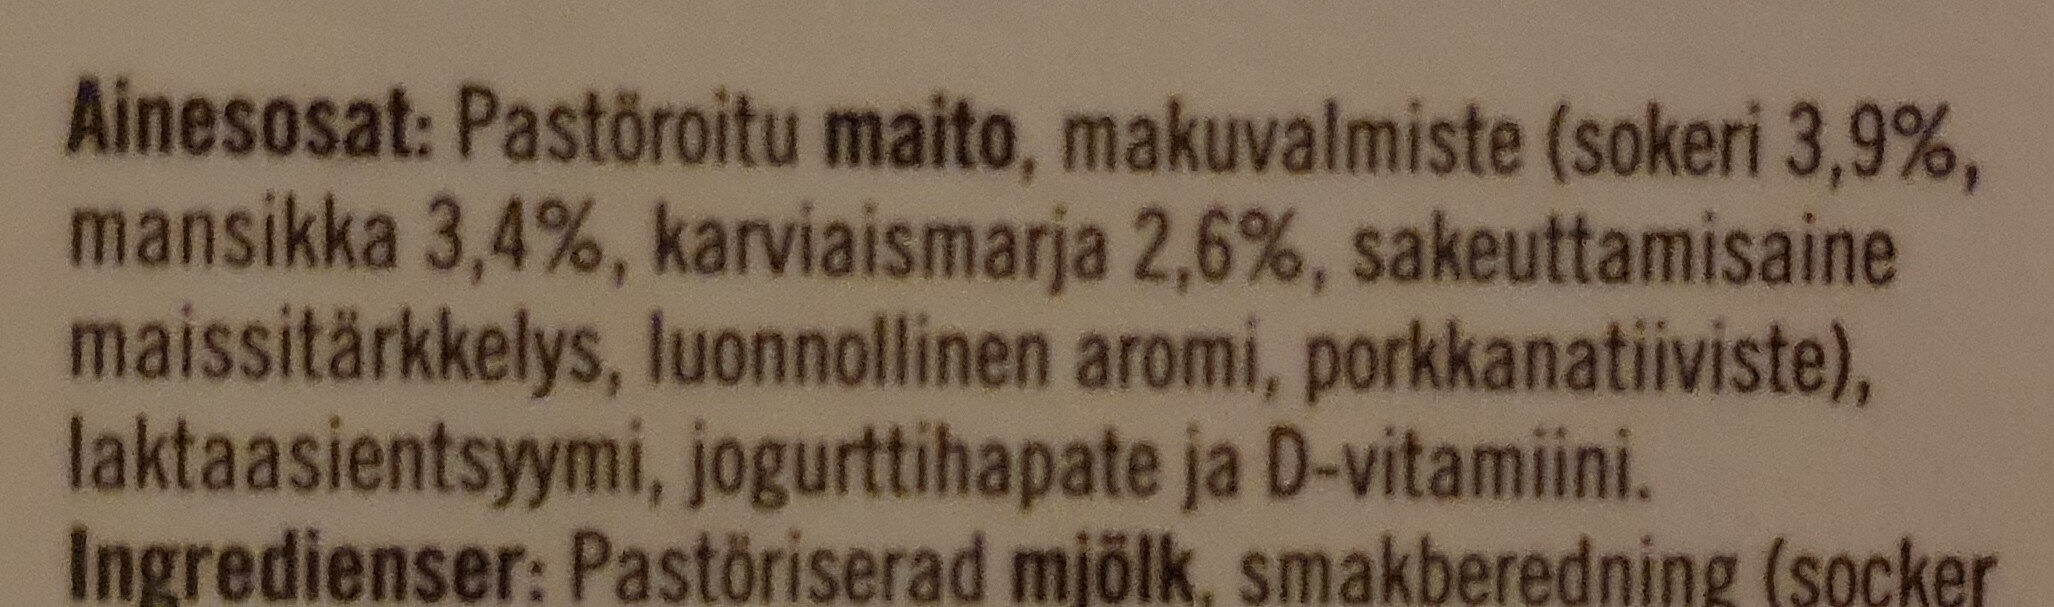 Karviaismarja-Sitruunaruoho-Jogurtti - Ingrédients - fi